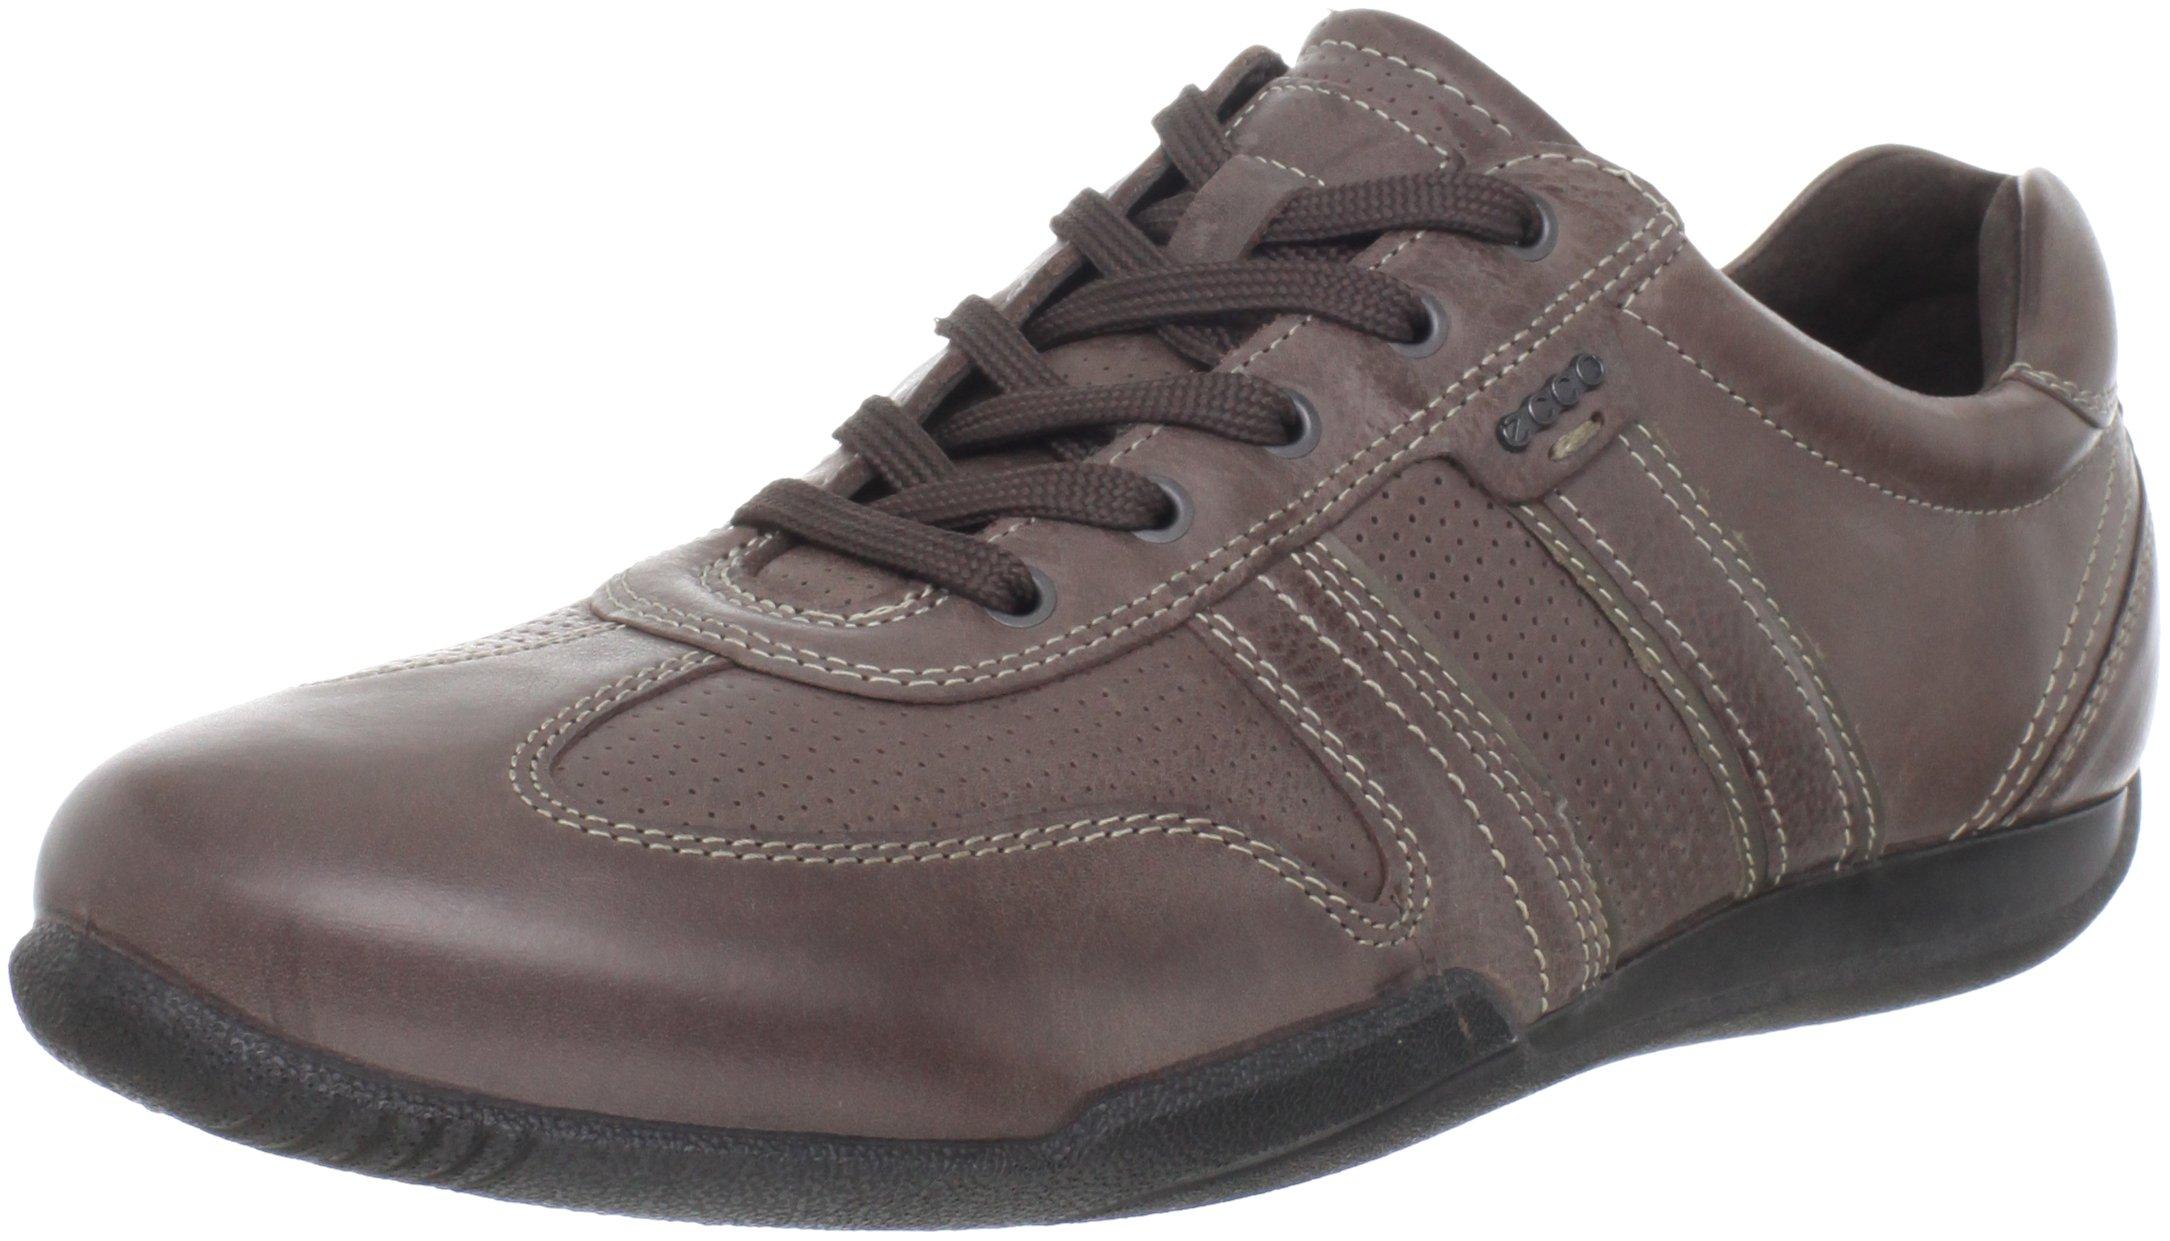 ECCO Men's Summer Sneaker,Coffee/Dark Clay,43 EU/9-9.5 M US